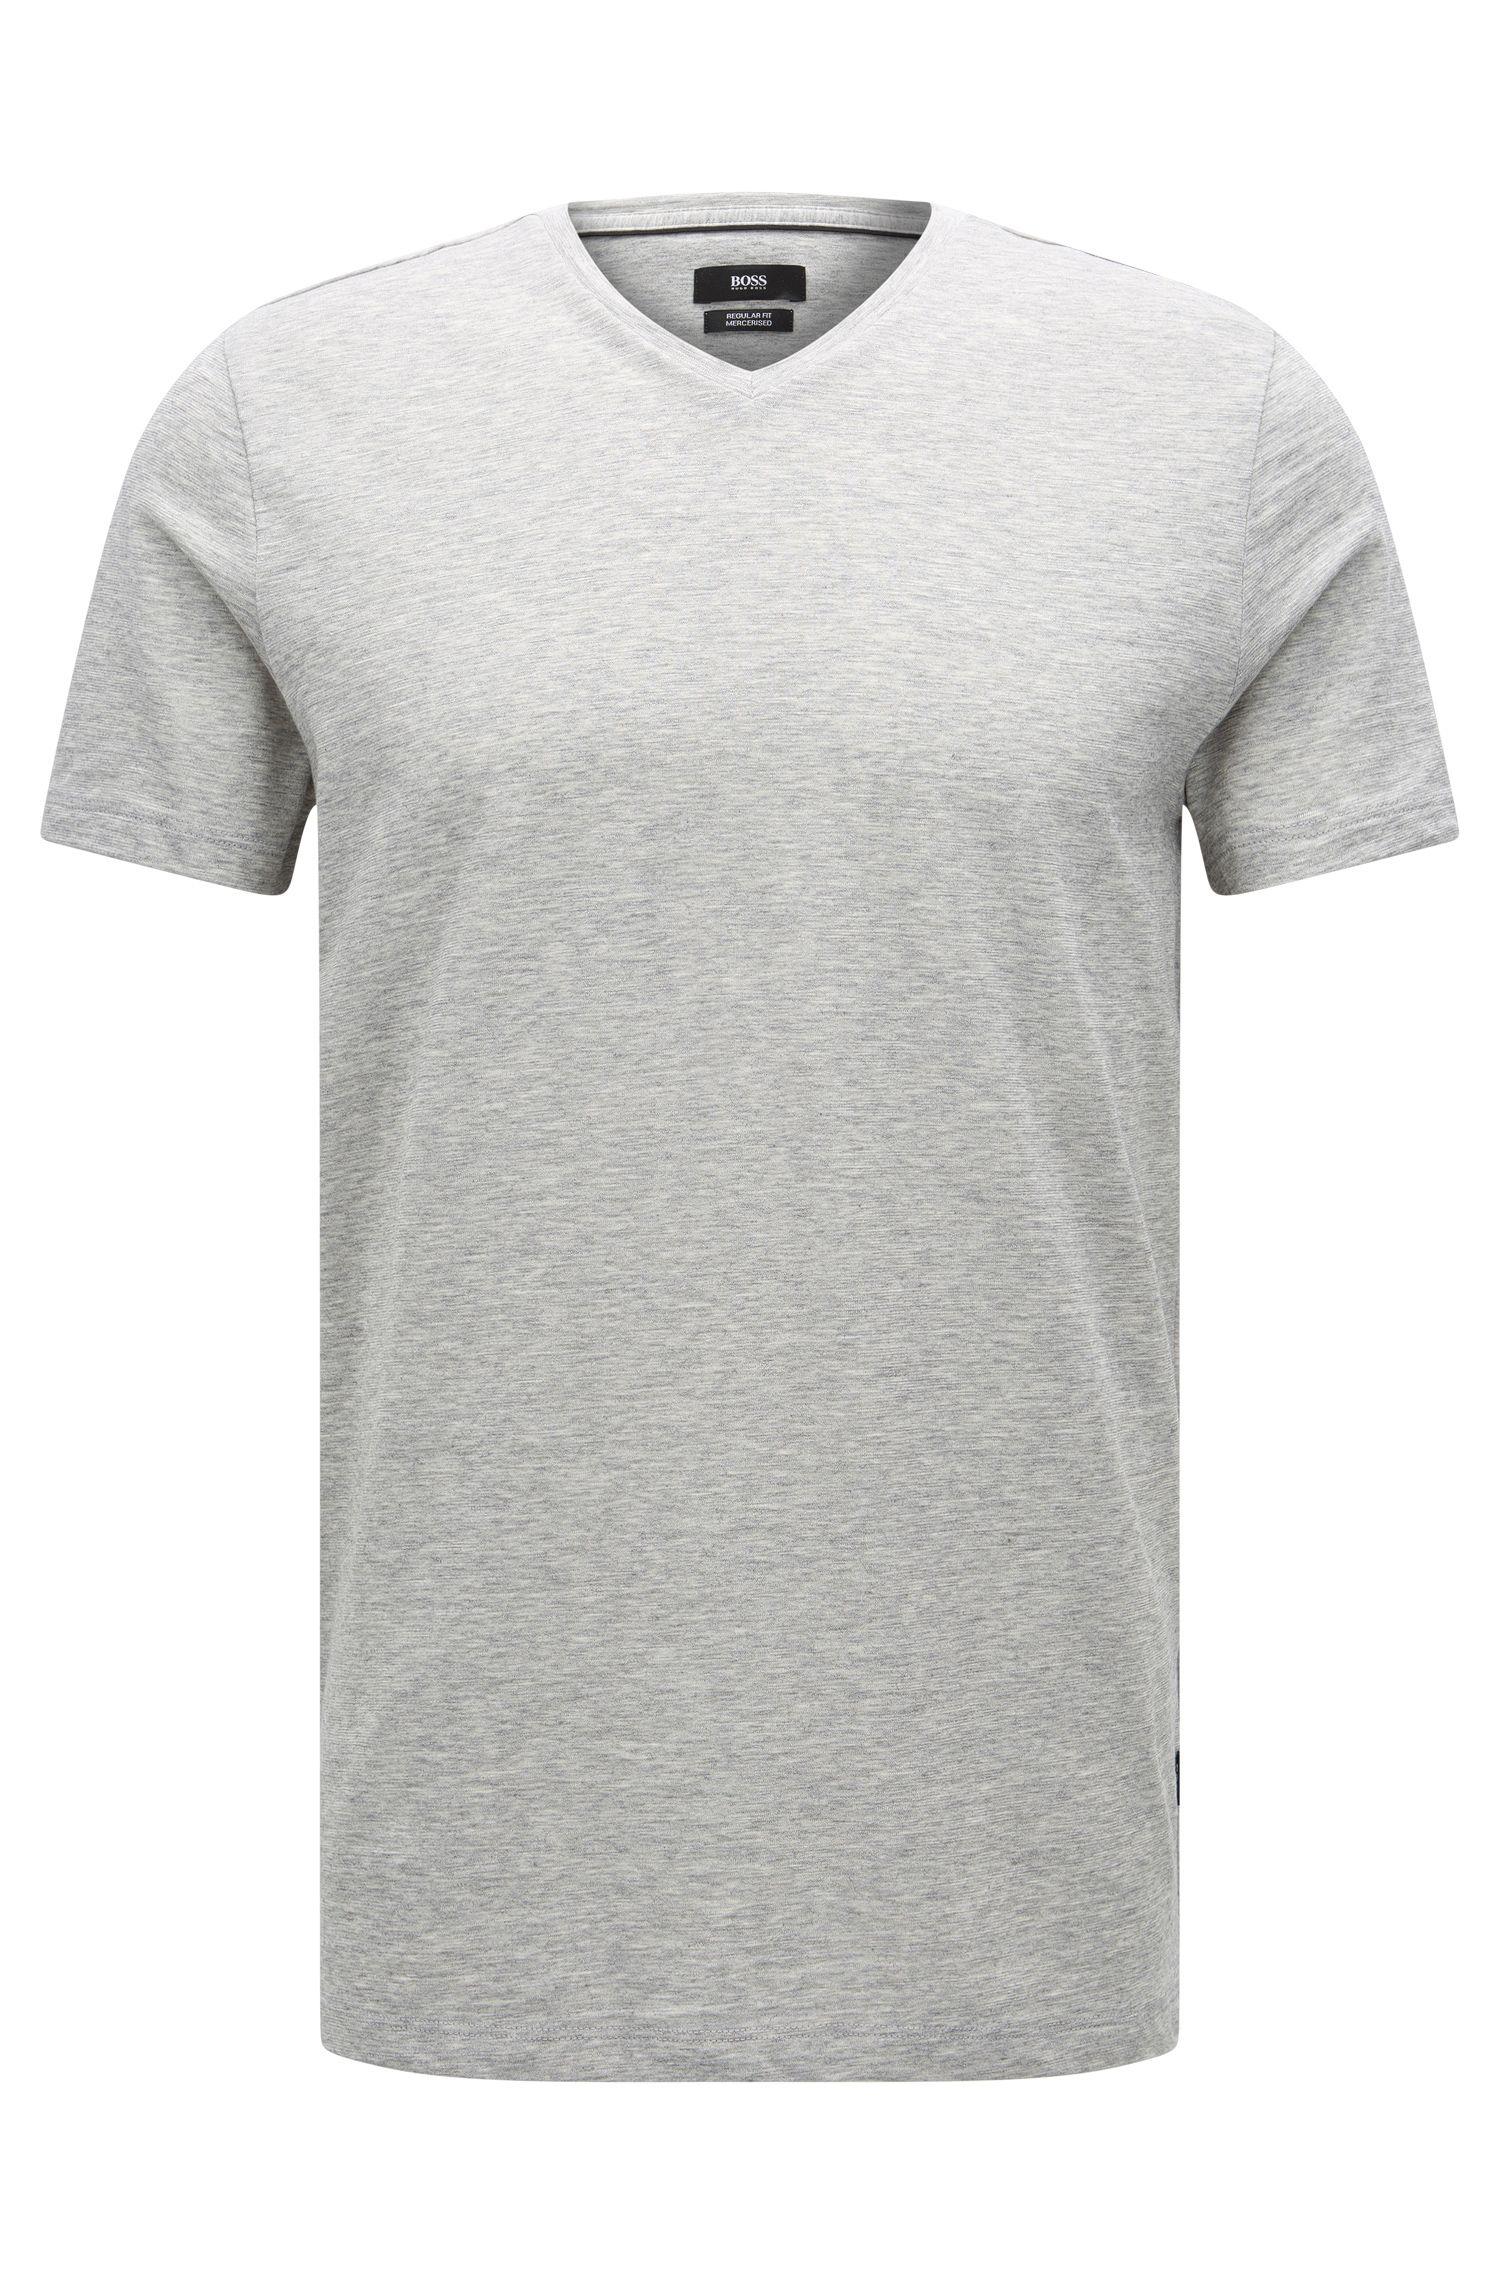 Regular-fit T-shirt in mercerised cotton